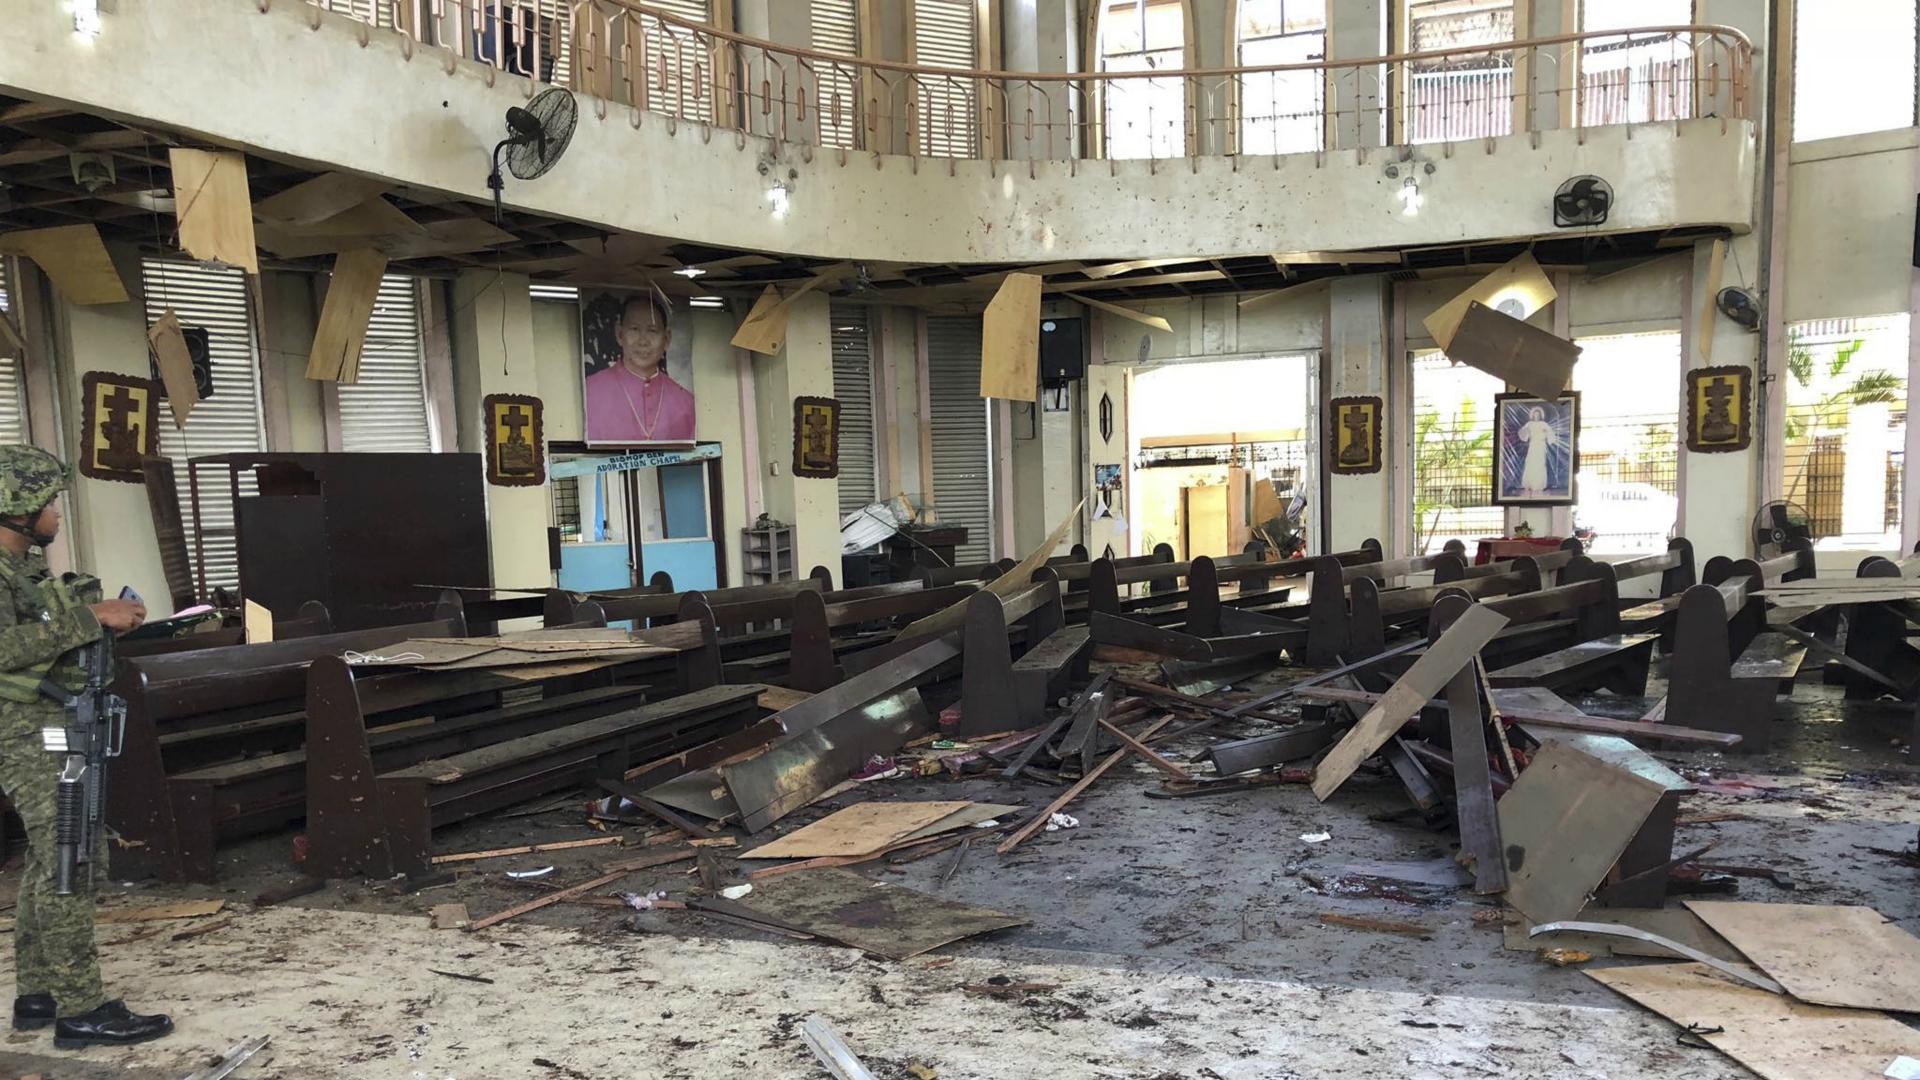 philippines church bombing 012719 AP_1548620266595.jpg.jpg